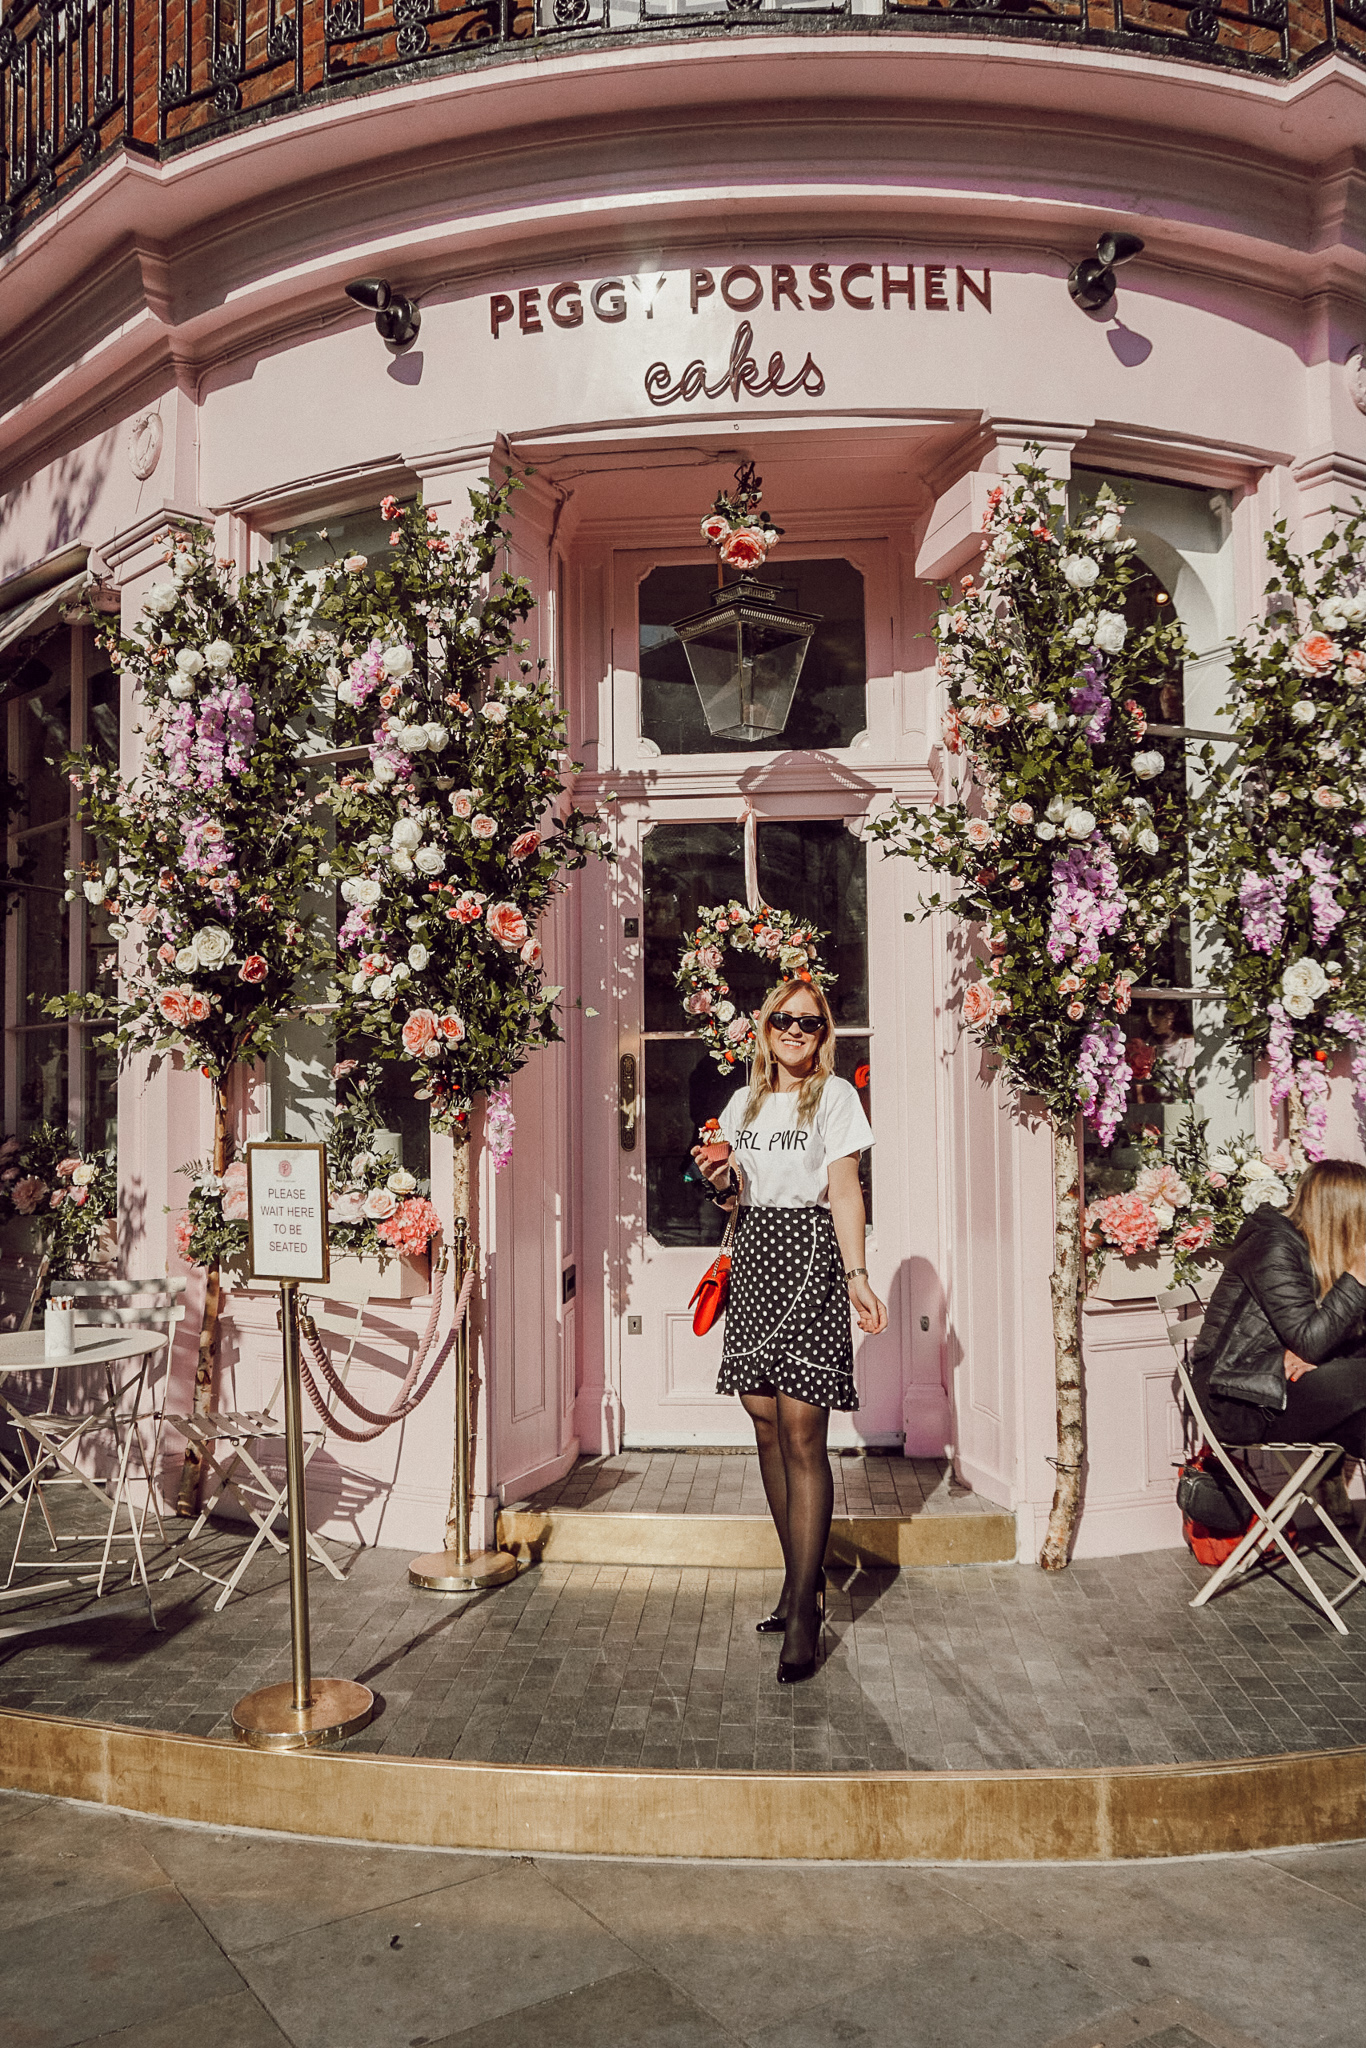 London City Guide Peggy Porschen